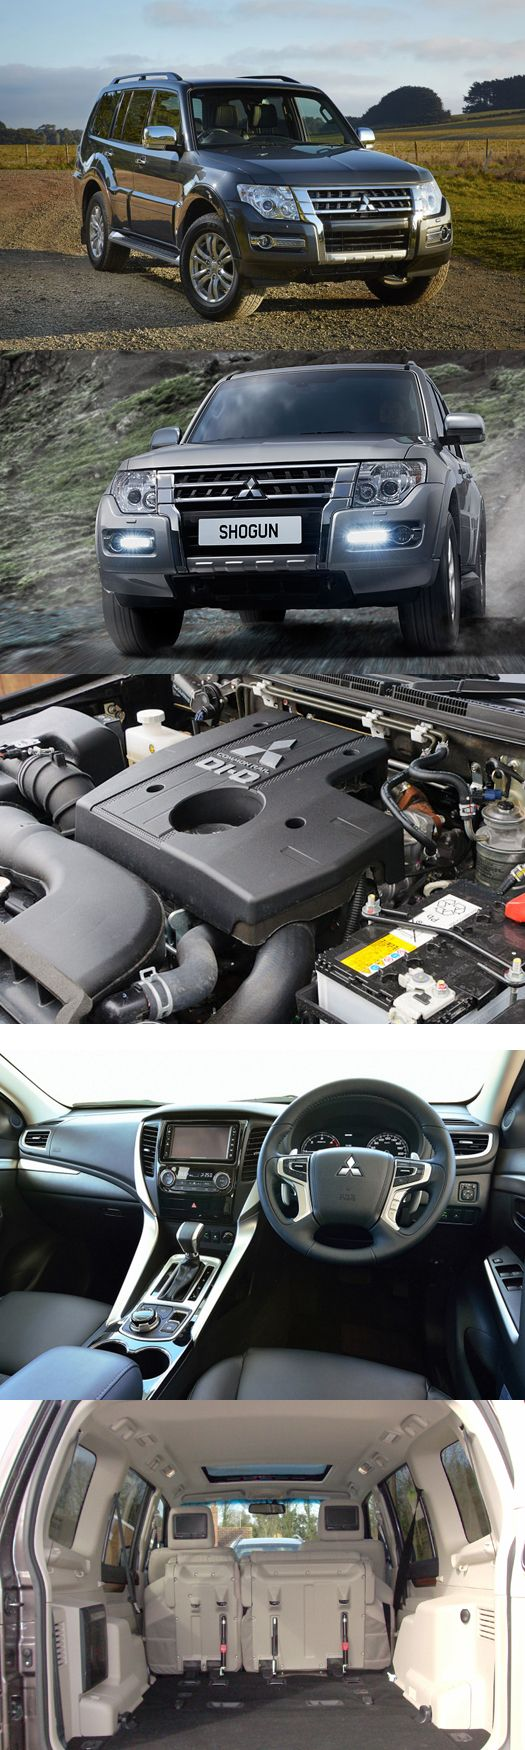 The #Mitsubishi #Shogun is a Rugged 4X4 For more read click: www.engines4sale.co.uk/blog/mitsubishi-shogun-rugged-4x4/